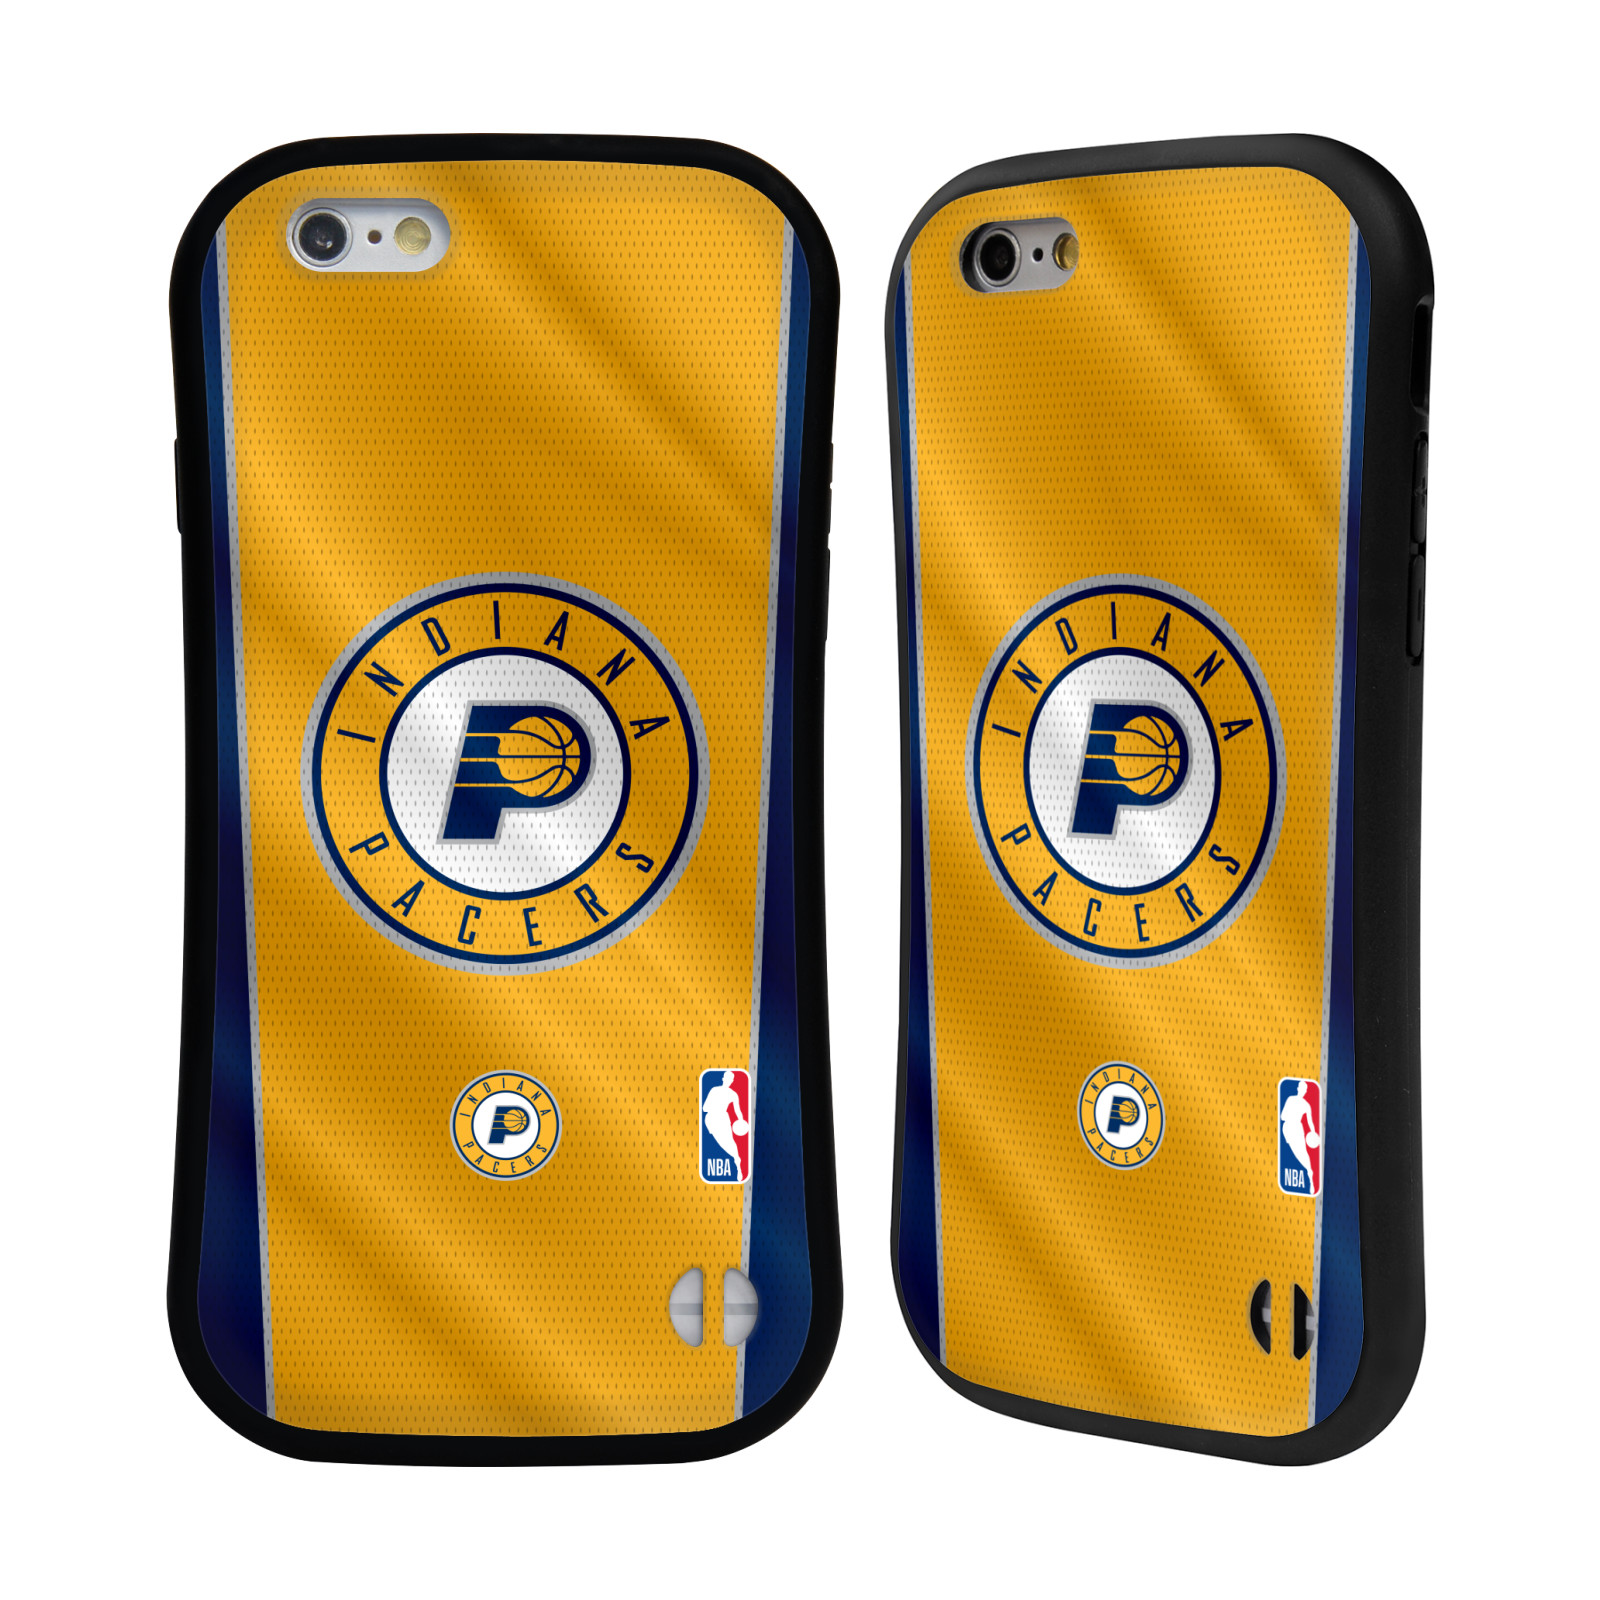 UFFICIALE-NBA-INDIANA-PACERS-CASE-IBRIDA-PER-APPLE-iPHONES-TELEFONI